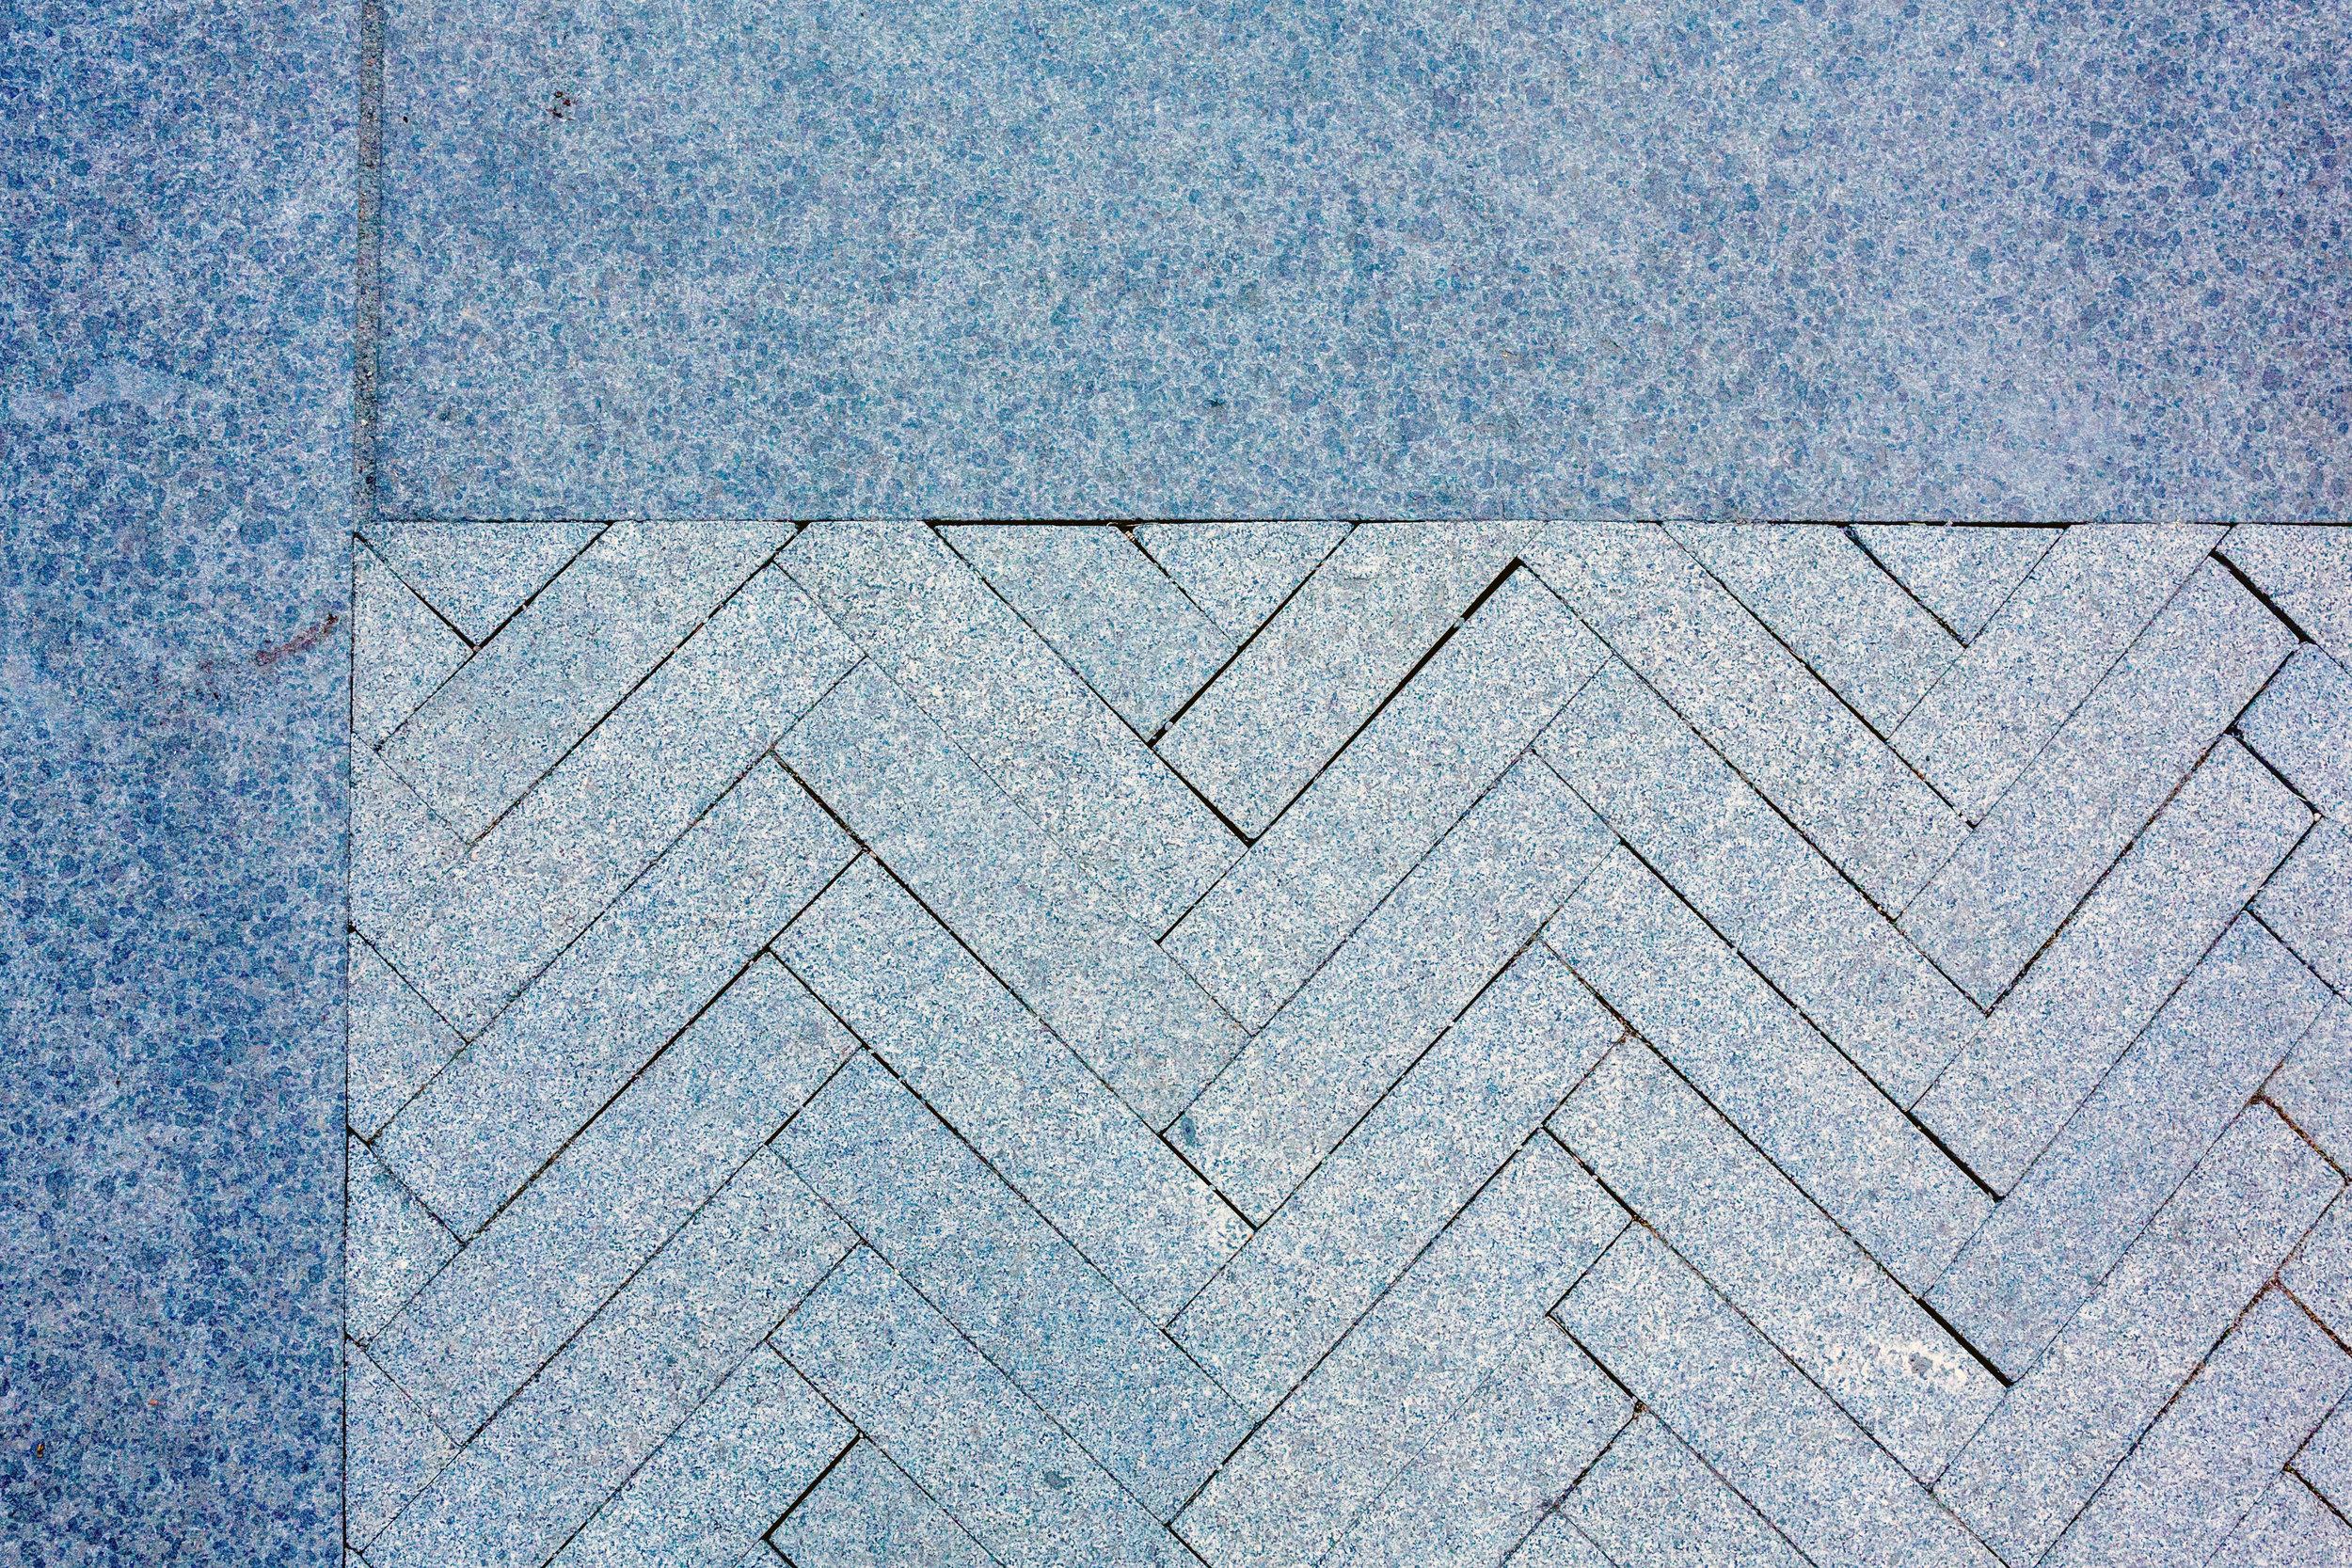 A sand-set herringbone pattern with a stone border.